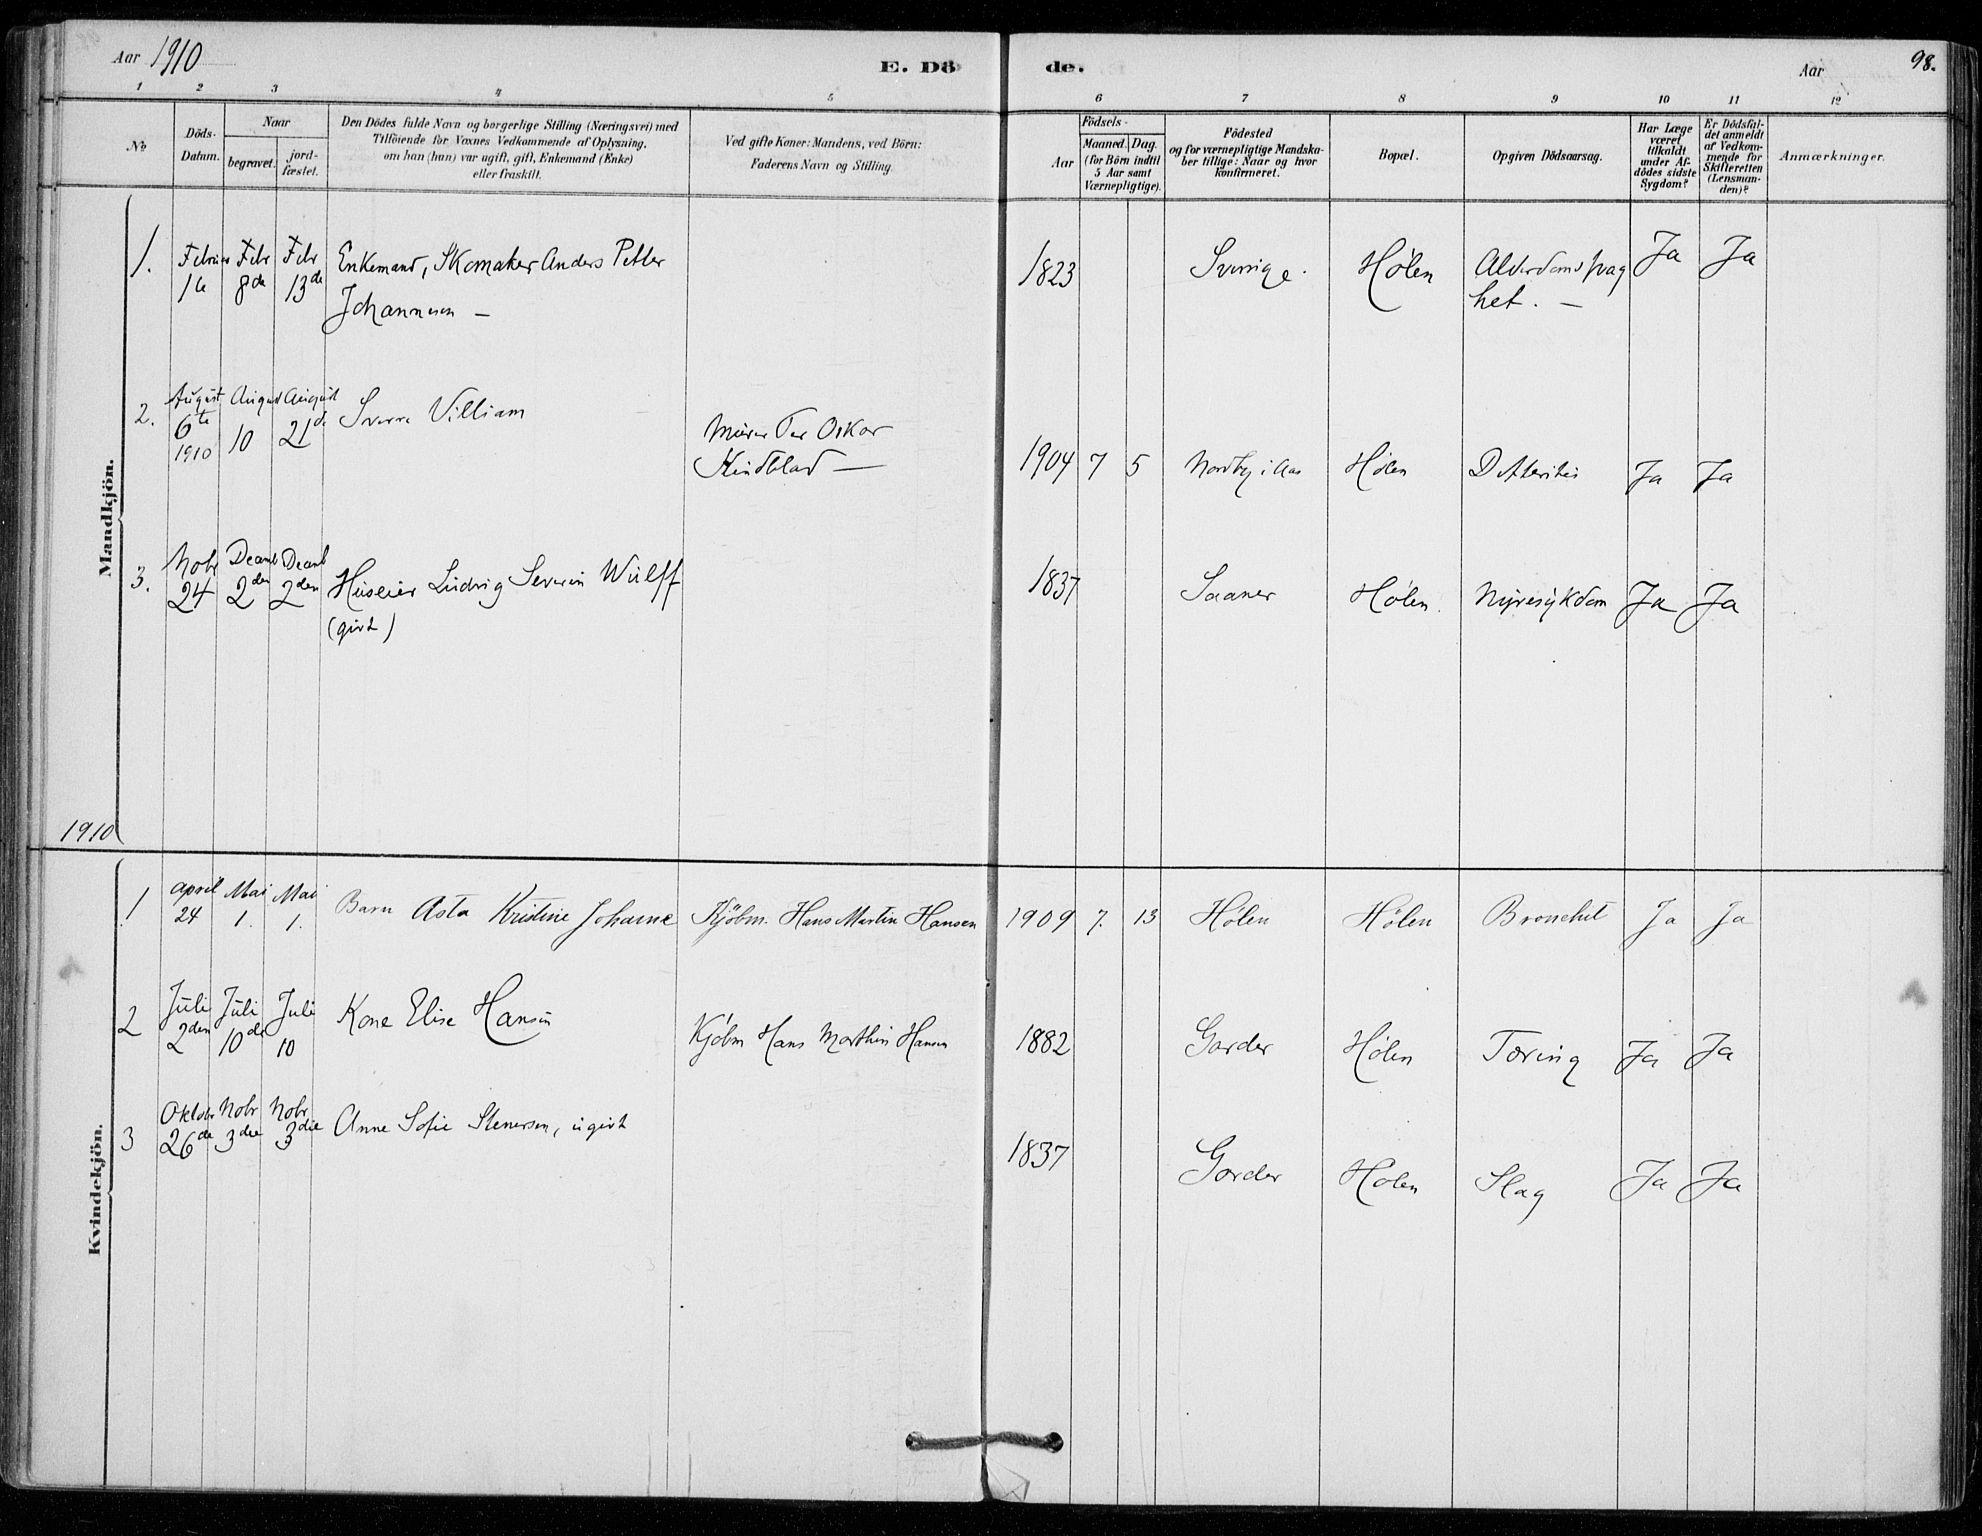 SAO, Vestby prestekontor Kirkebøker, F/Fe/L0001: Ministerialbok nr. V 1, 1878-1931, s. 98